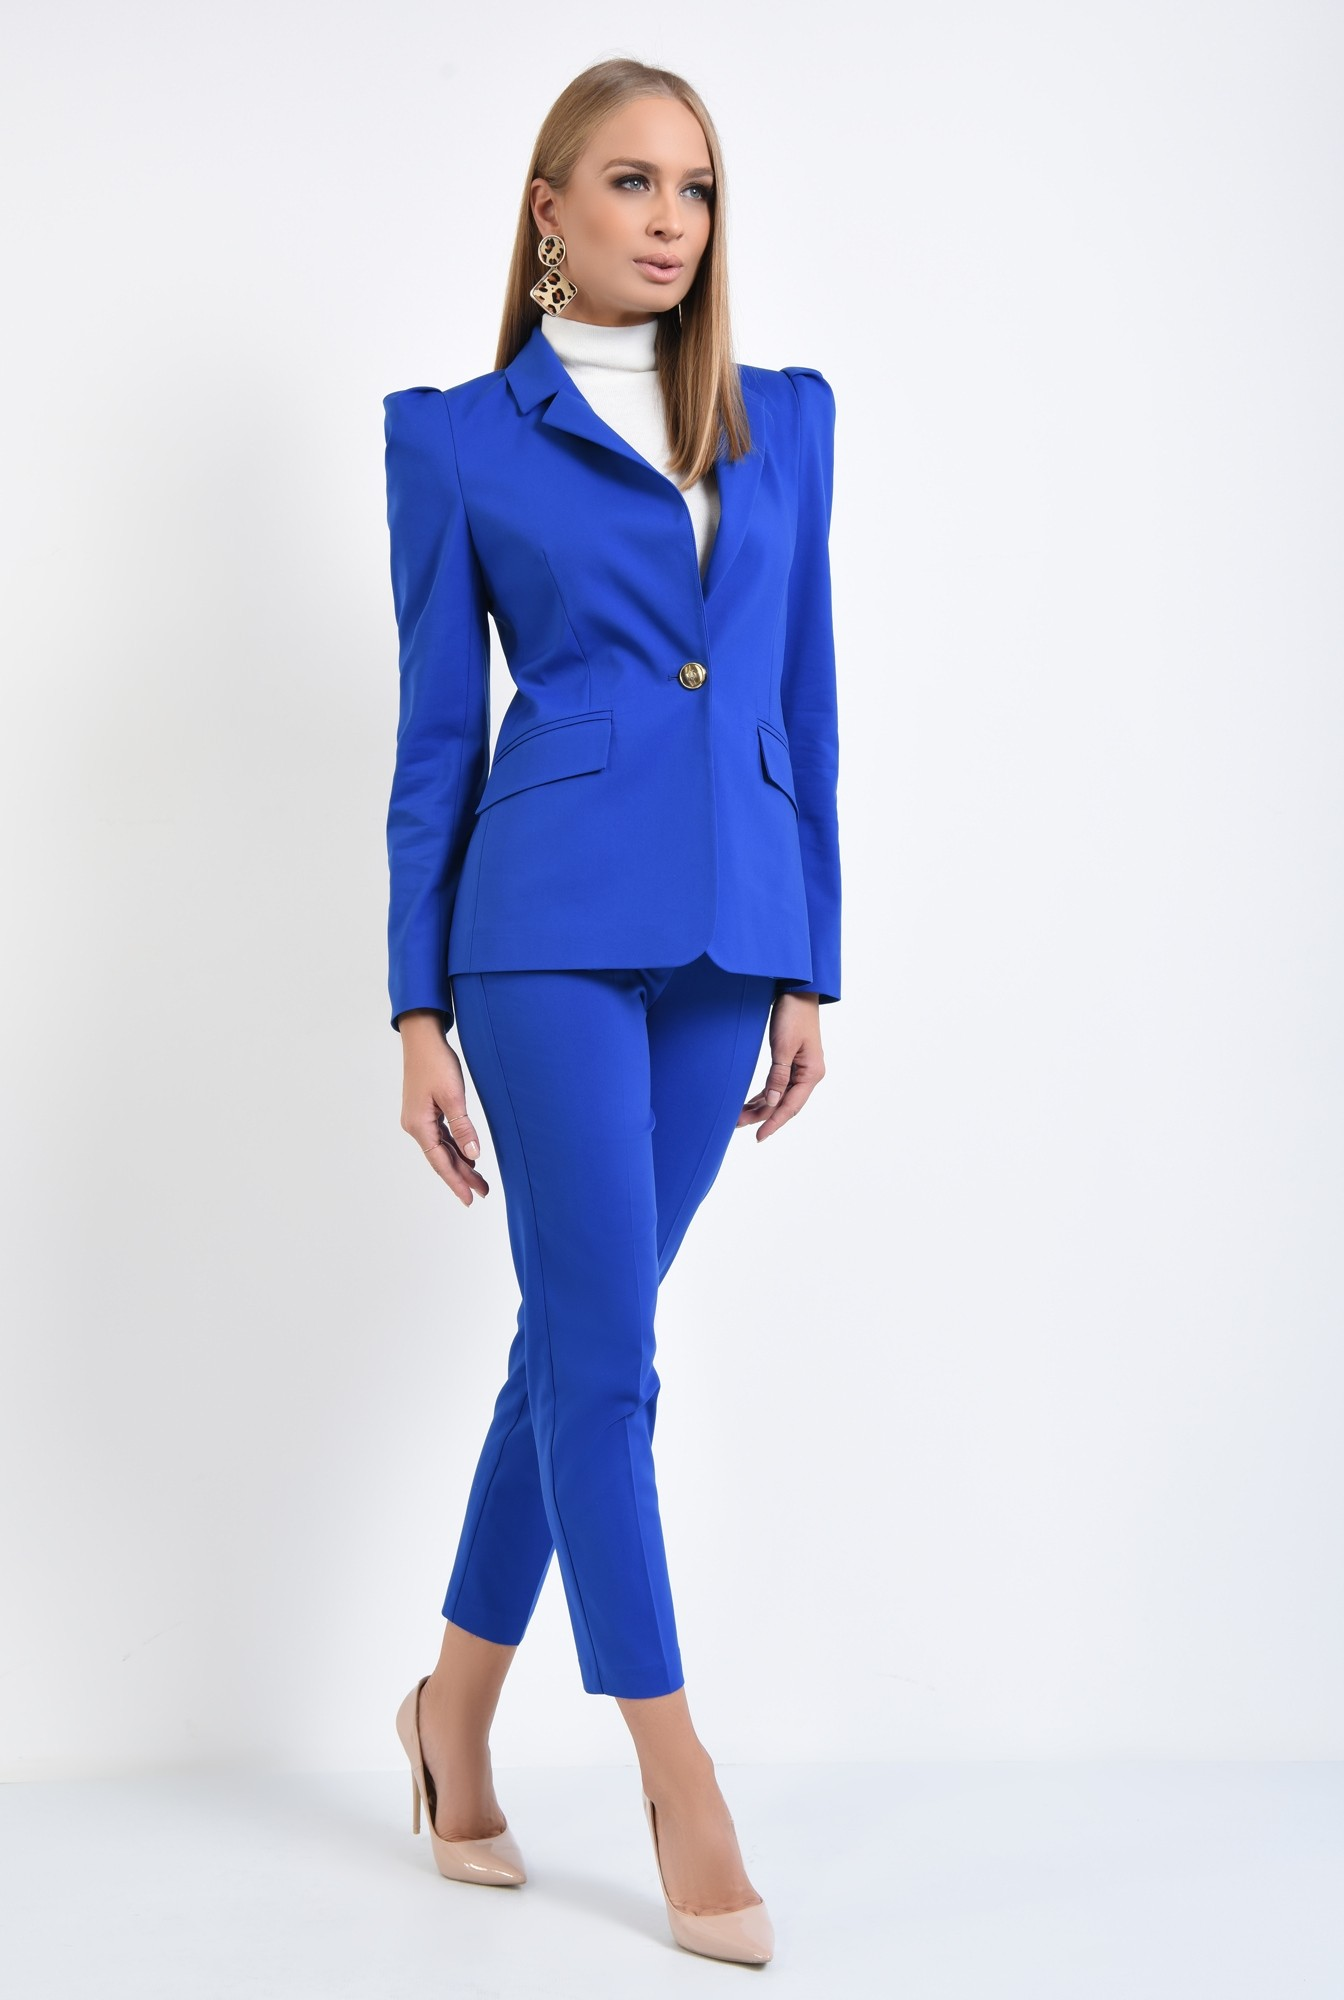 3 - pantaloni dama, online, costum, albastru, croi conic